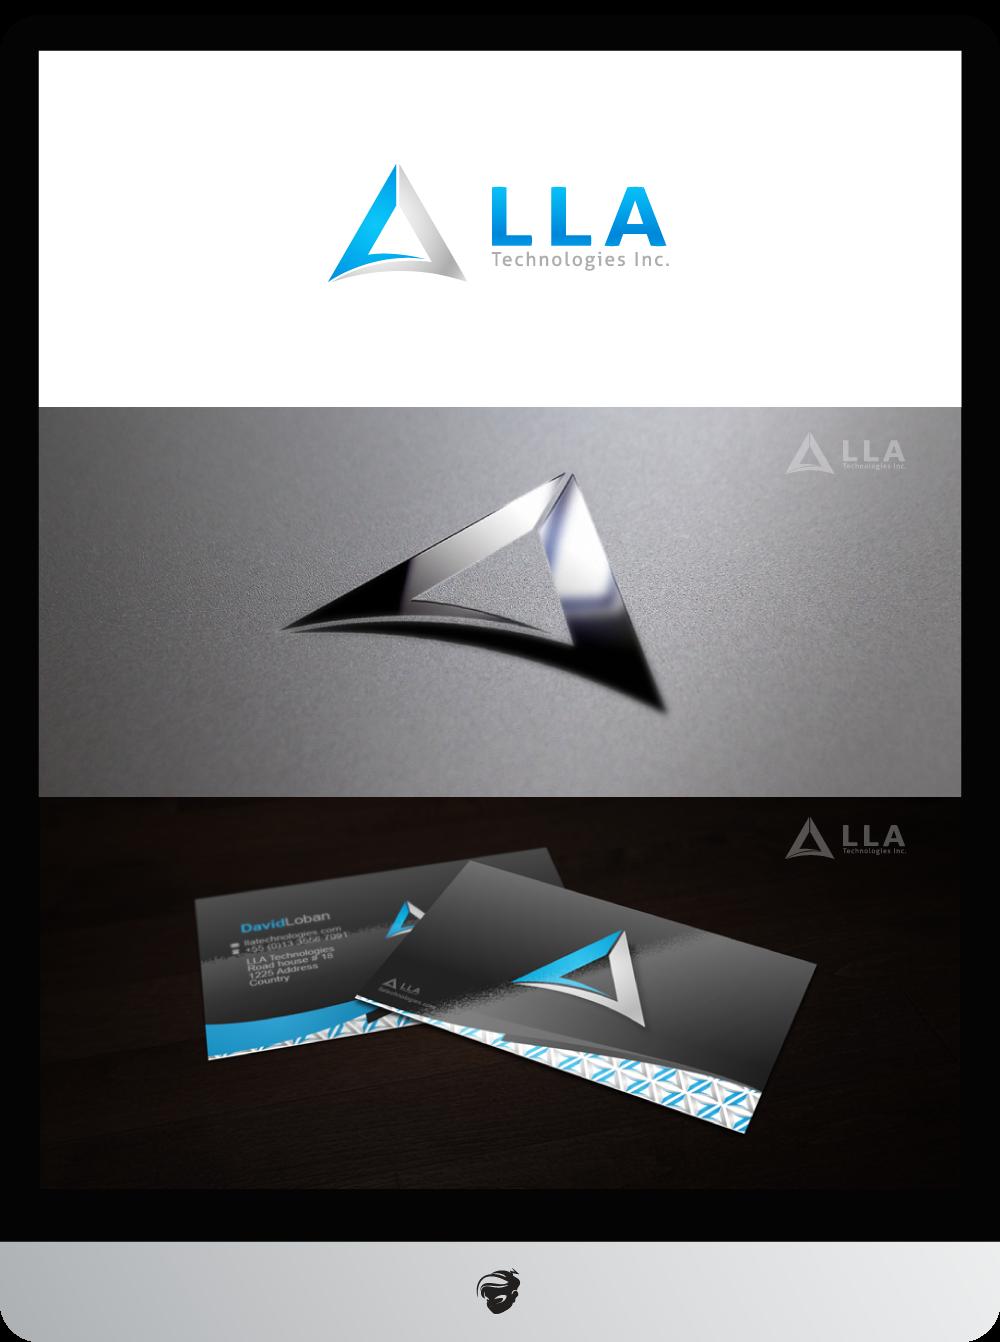 Logo Design by zesthar - Entry No. 222 in the Logo Design Contest Inspiring Logo Design for LLA Technologies Inc..